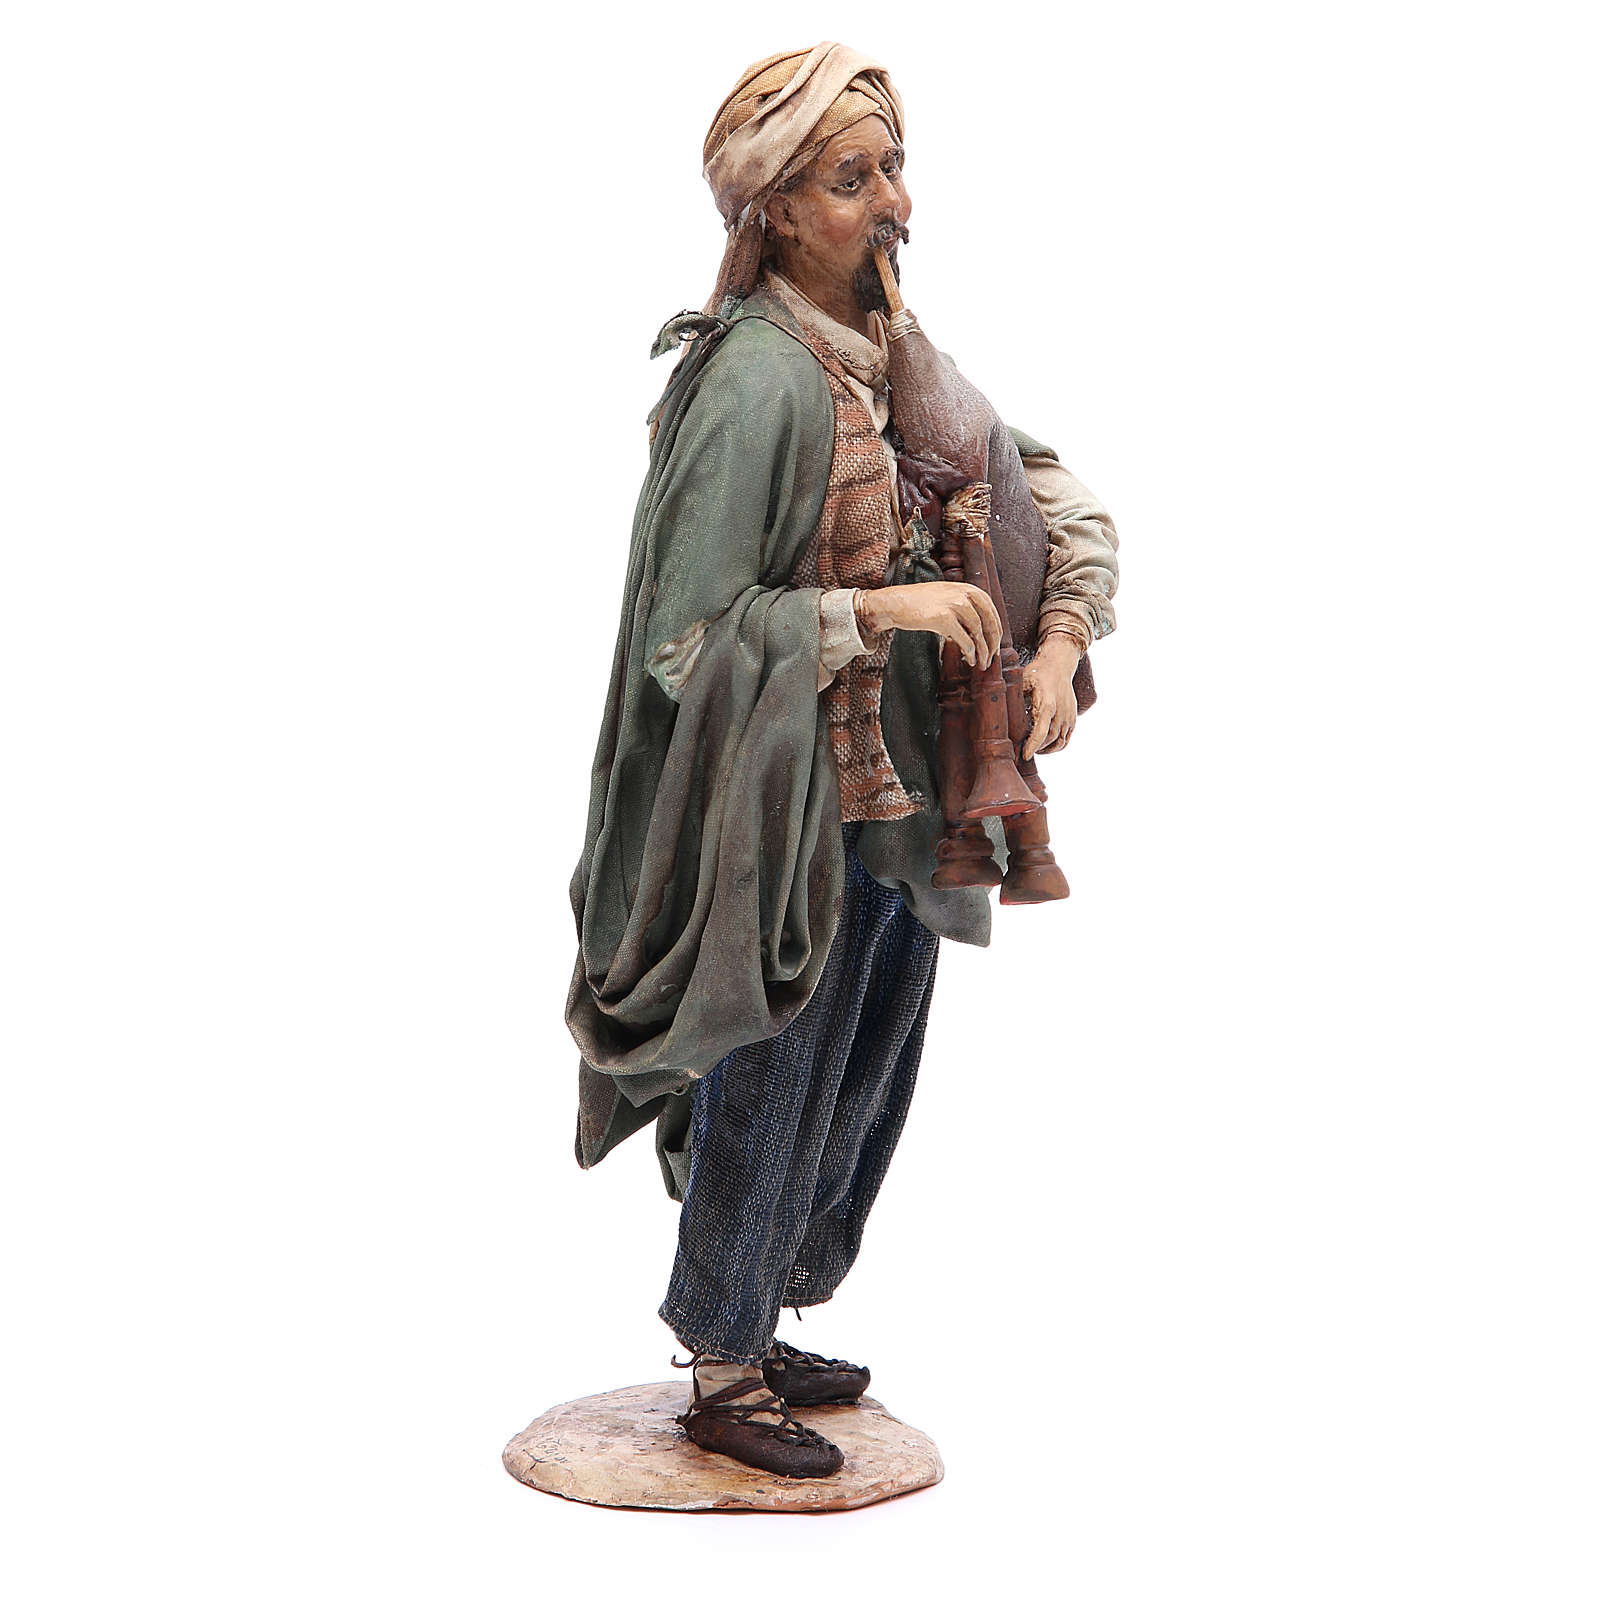 Nativity scene figurine, bagpiper player, Angela Tripi 4